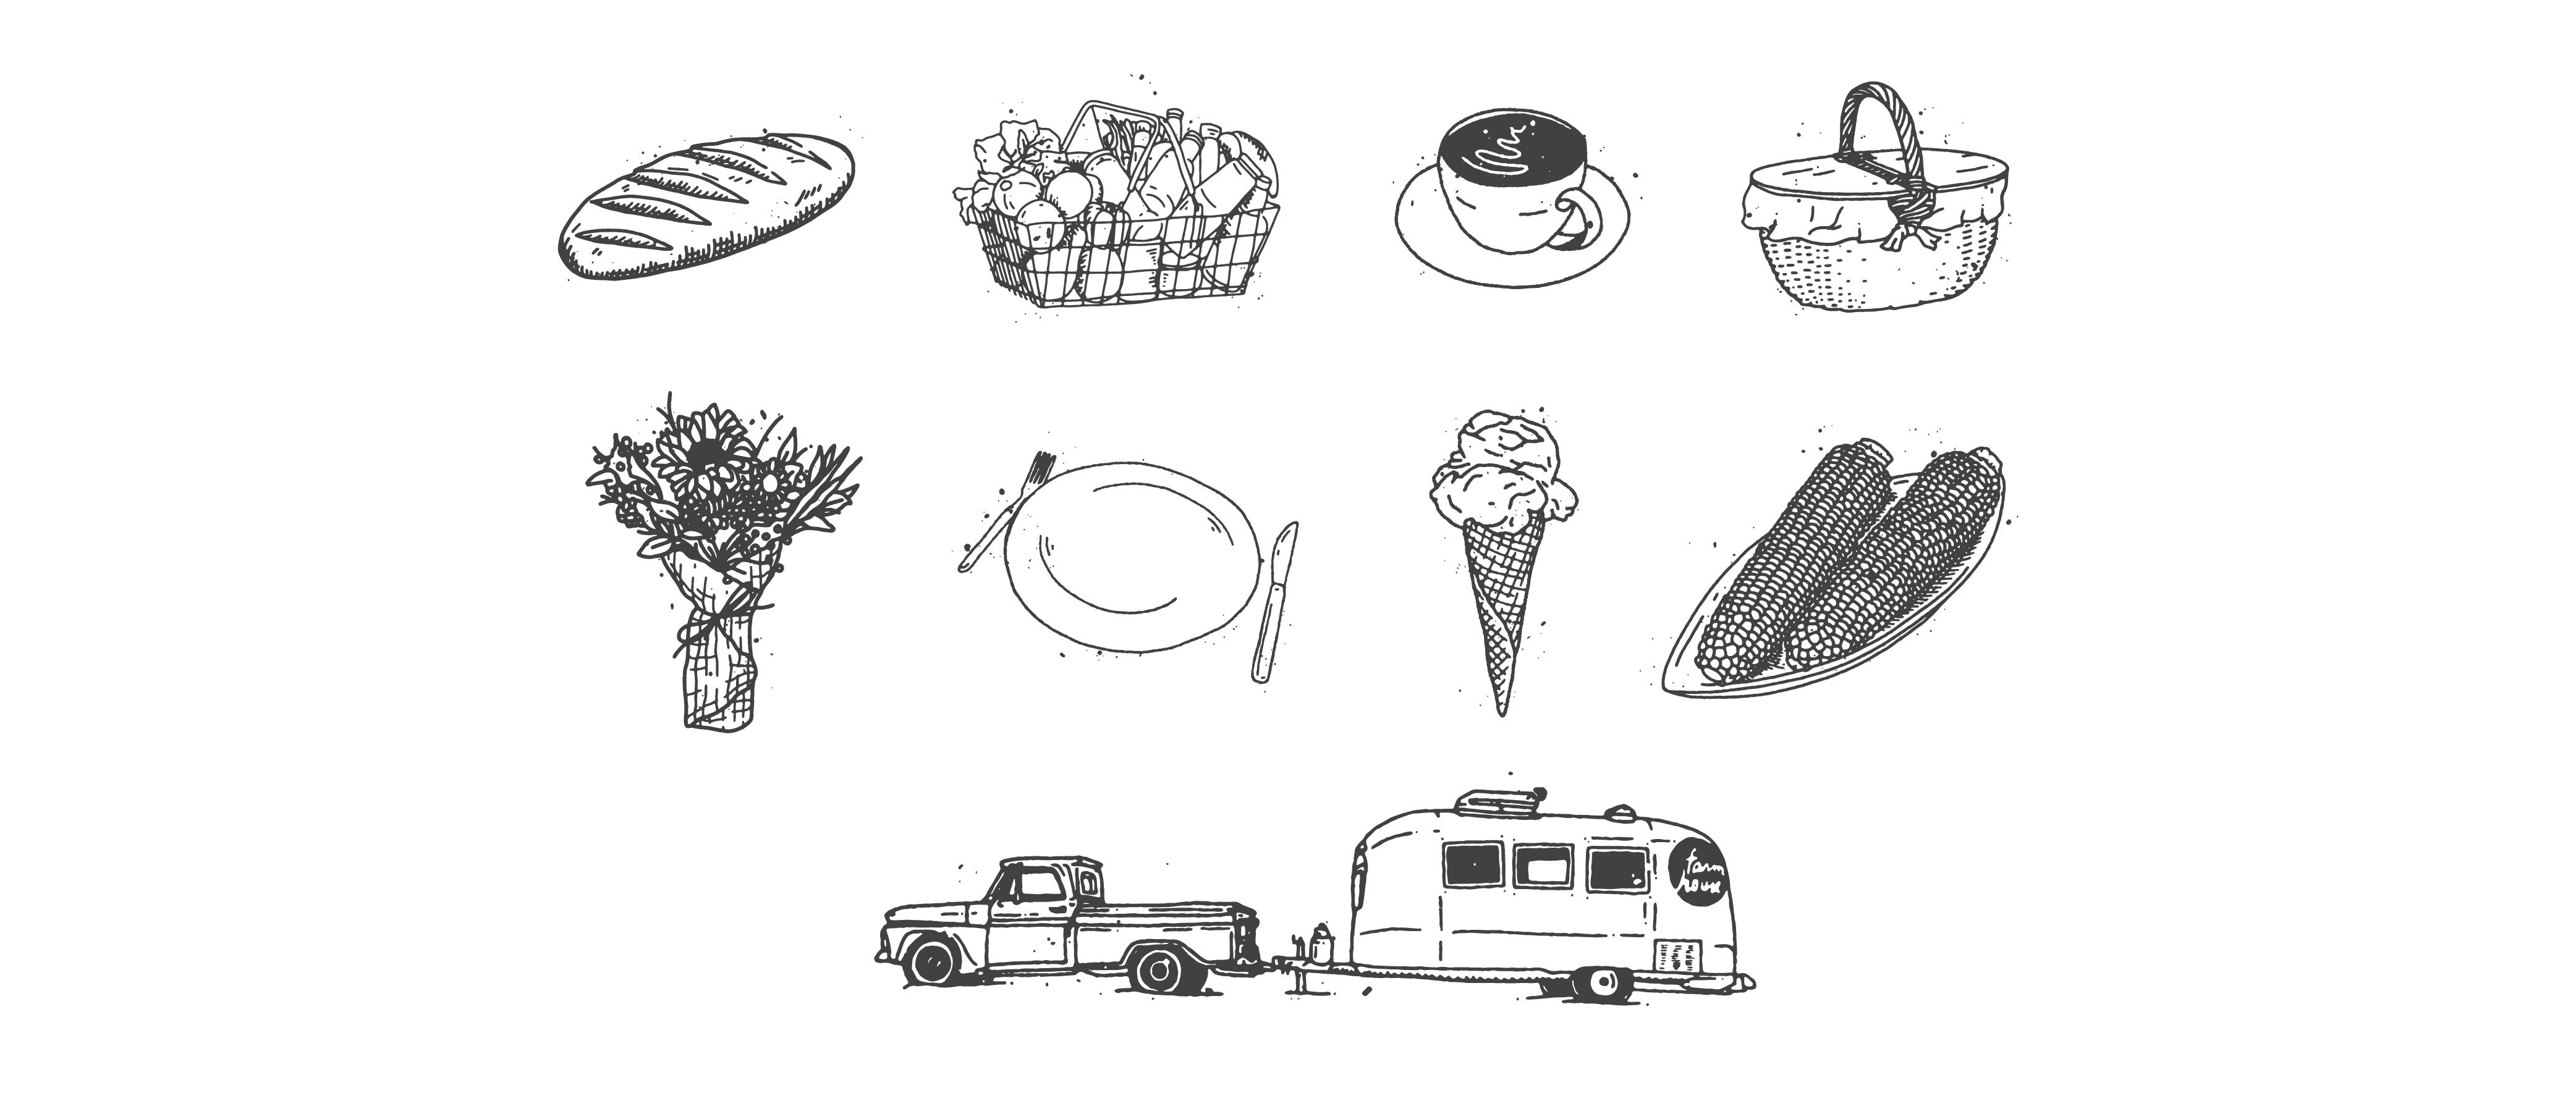 custom hand drawn illustrations